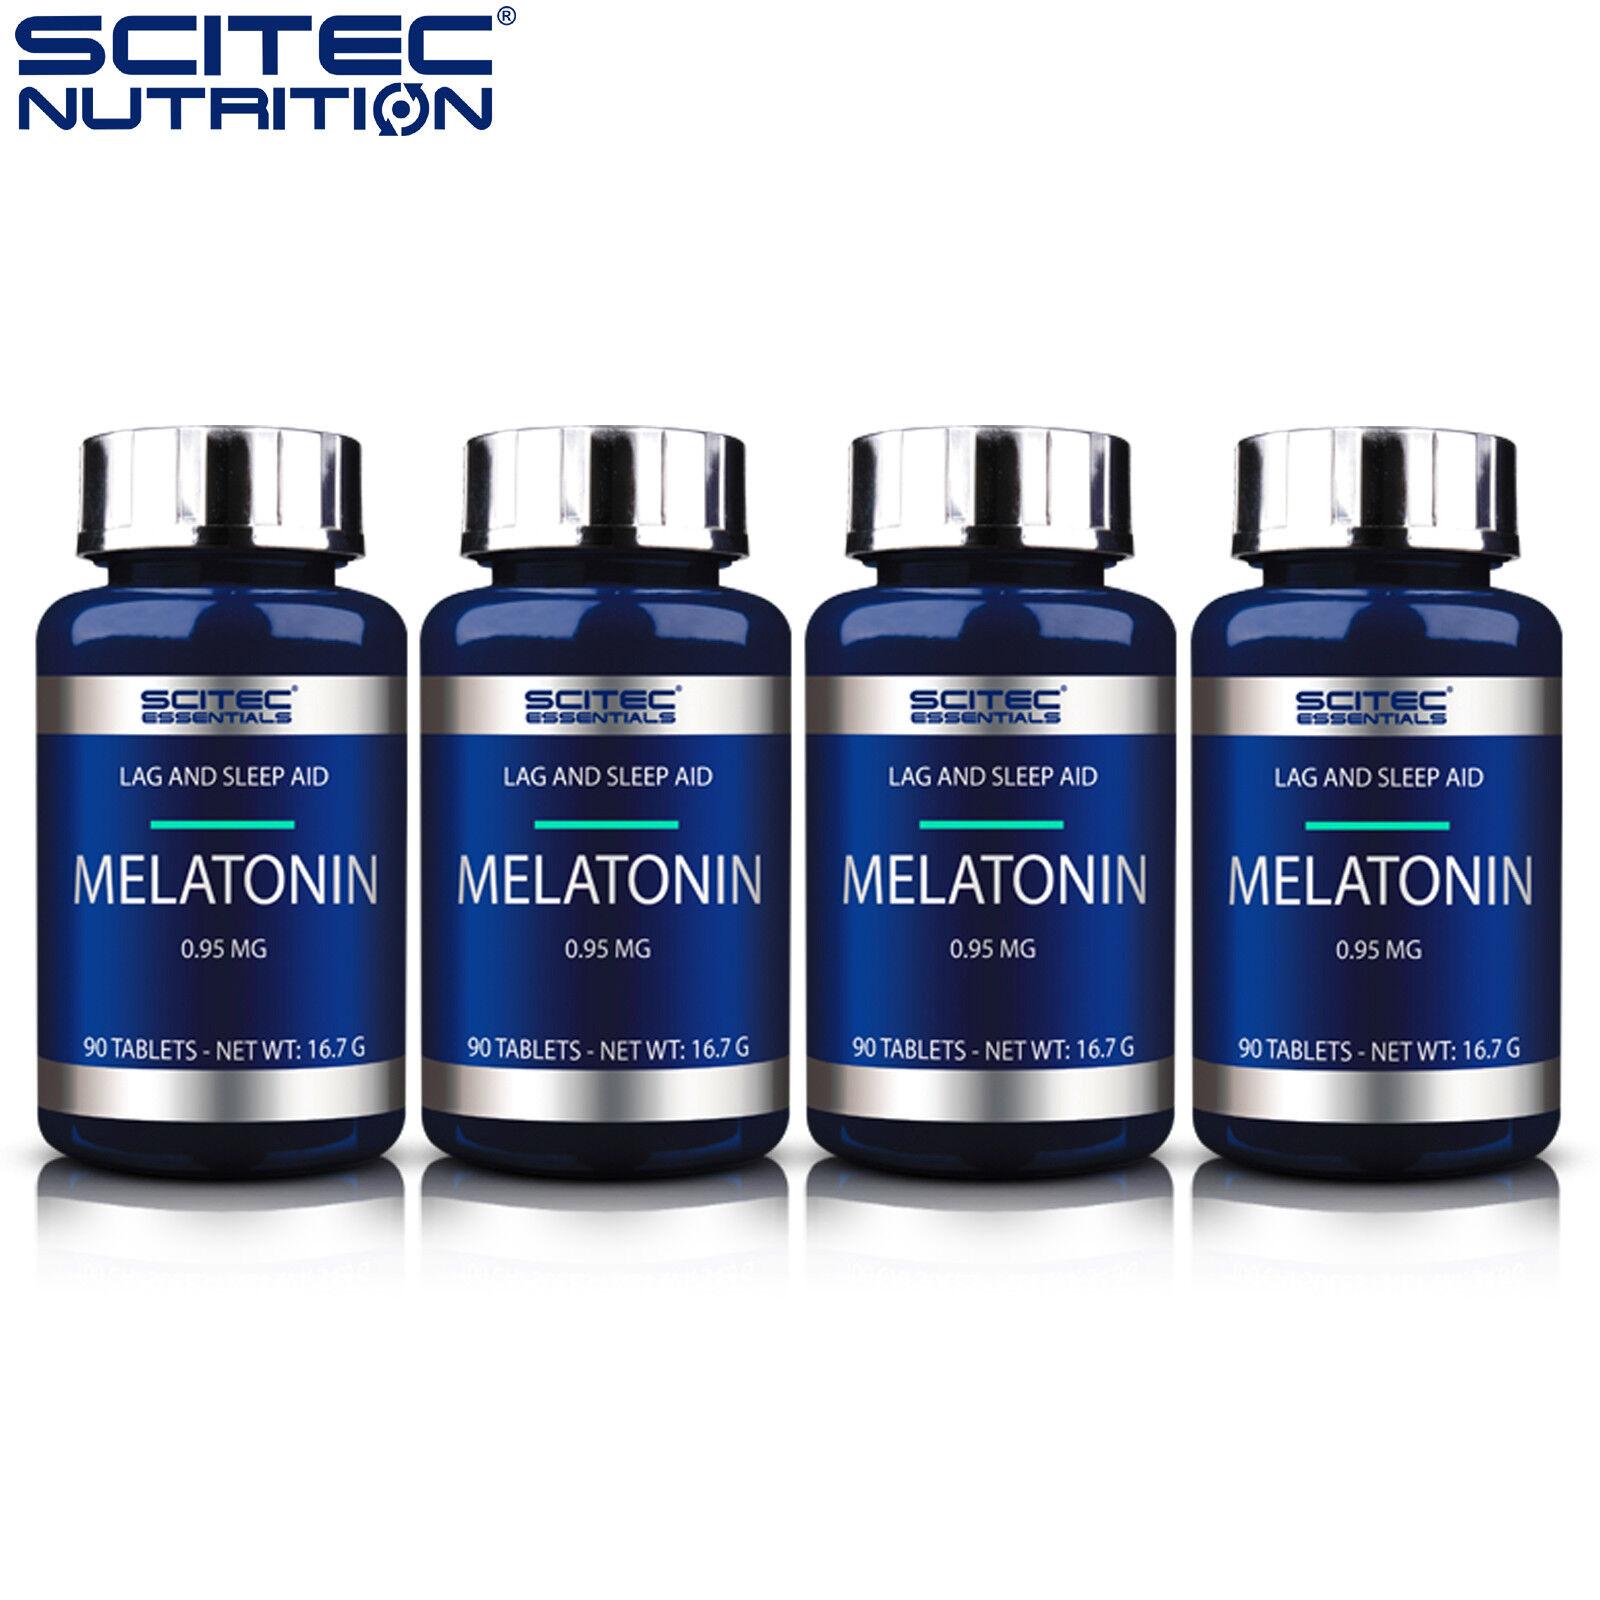 MELATONIN 90-450 Natural Sleep Aid Antidepressant Serotonin